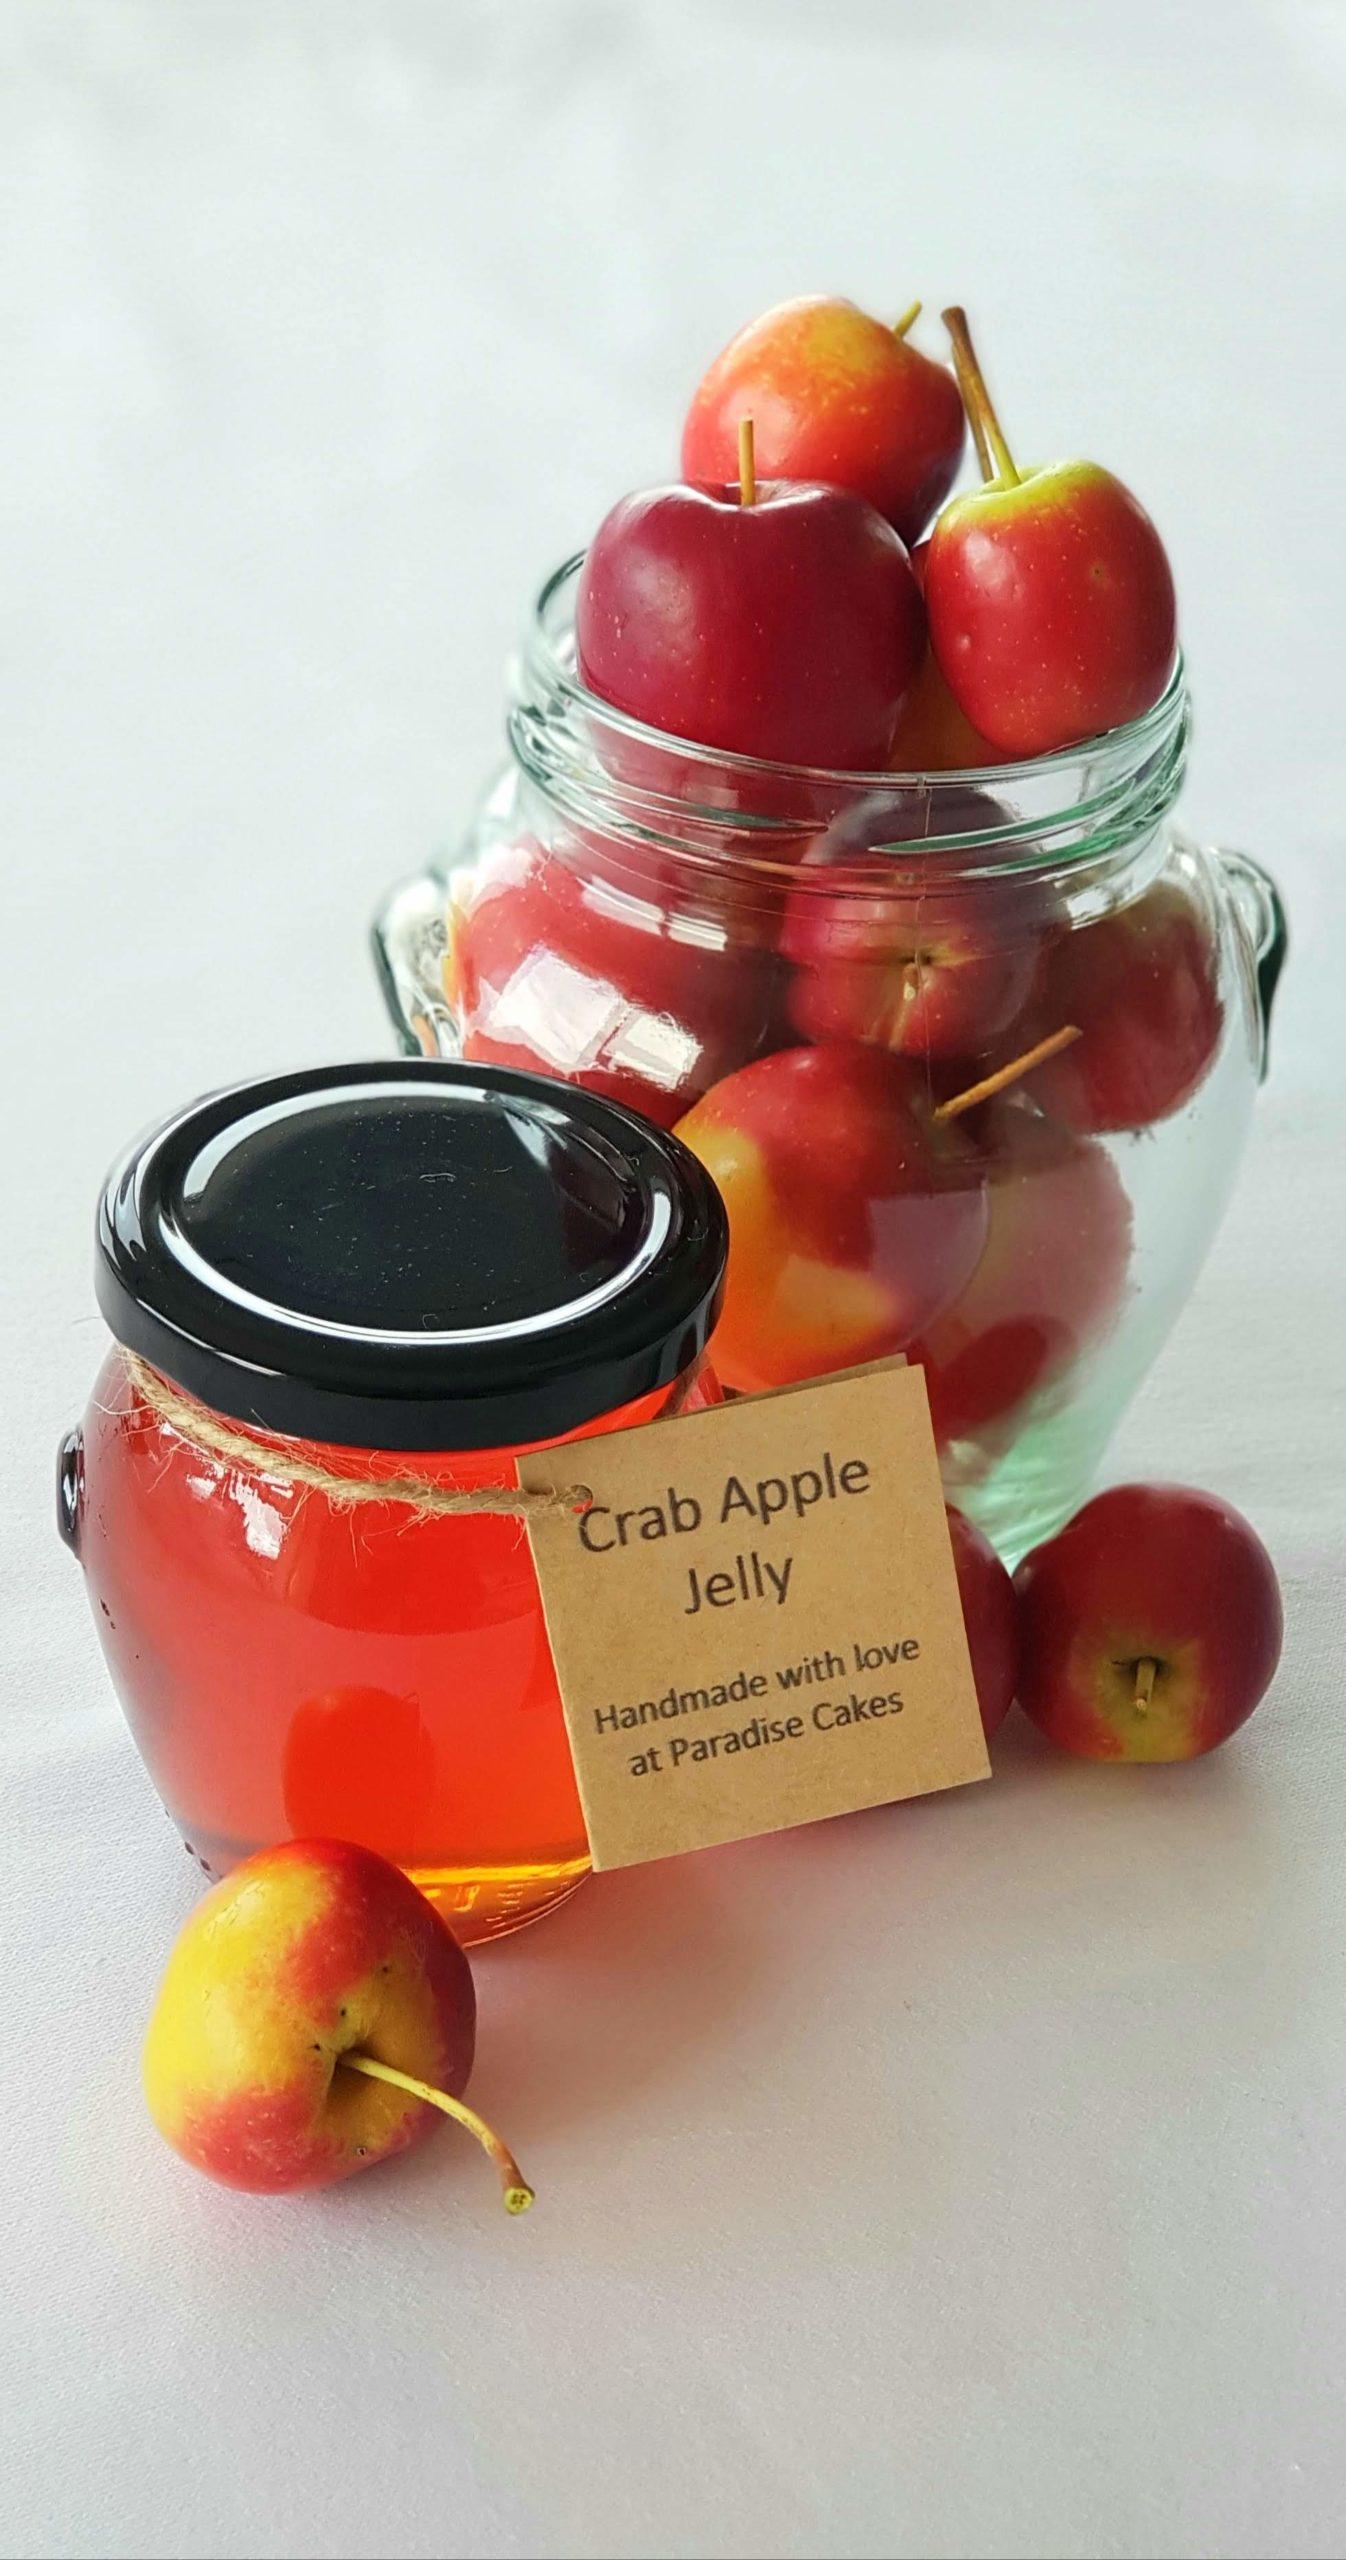 2. Crab apple jelly